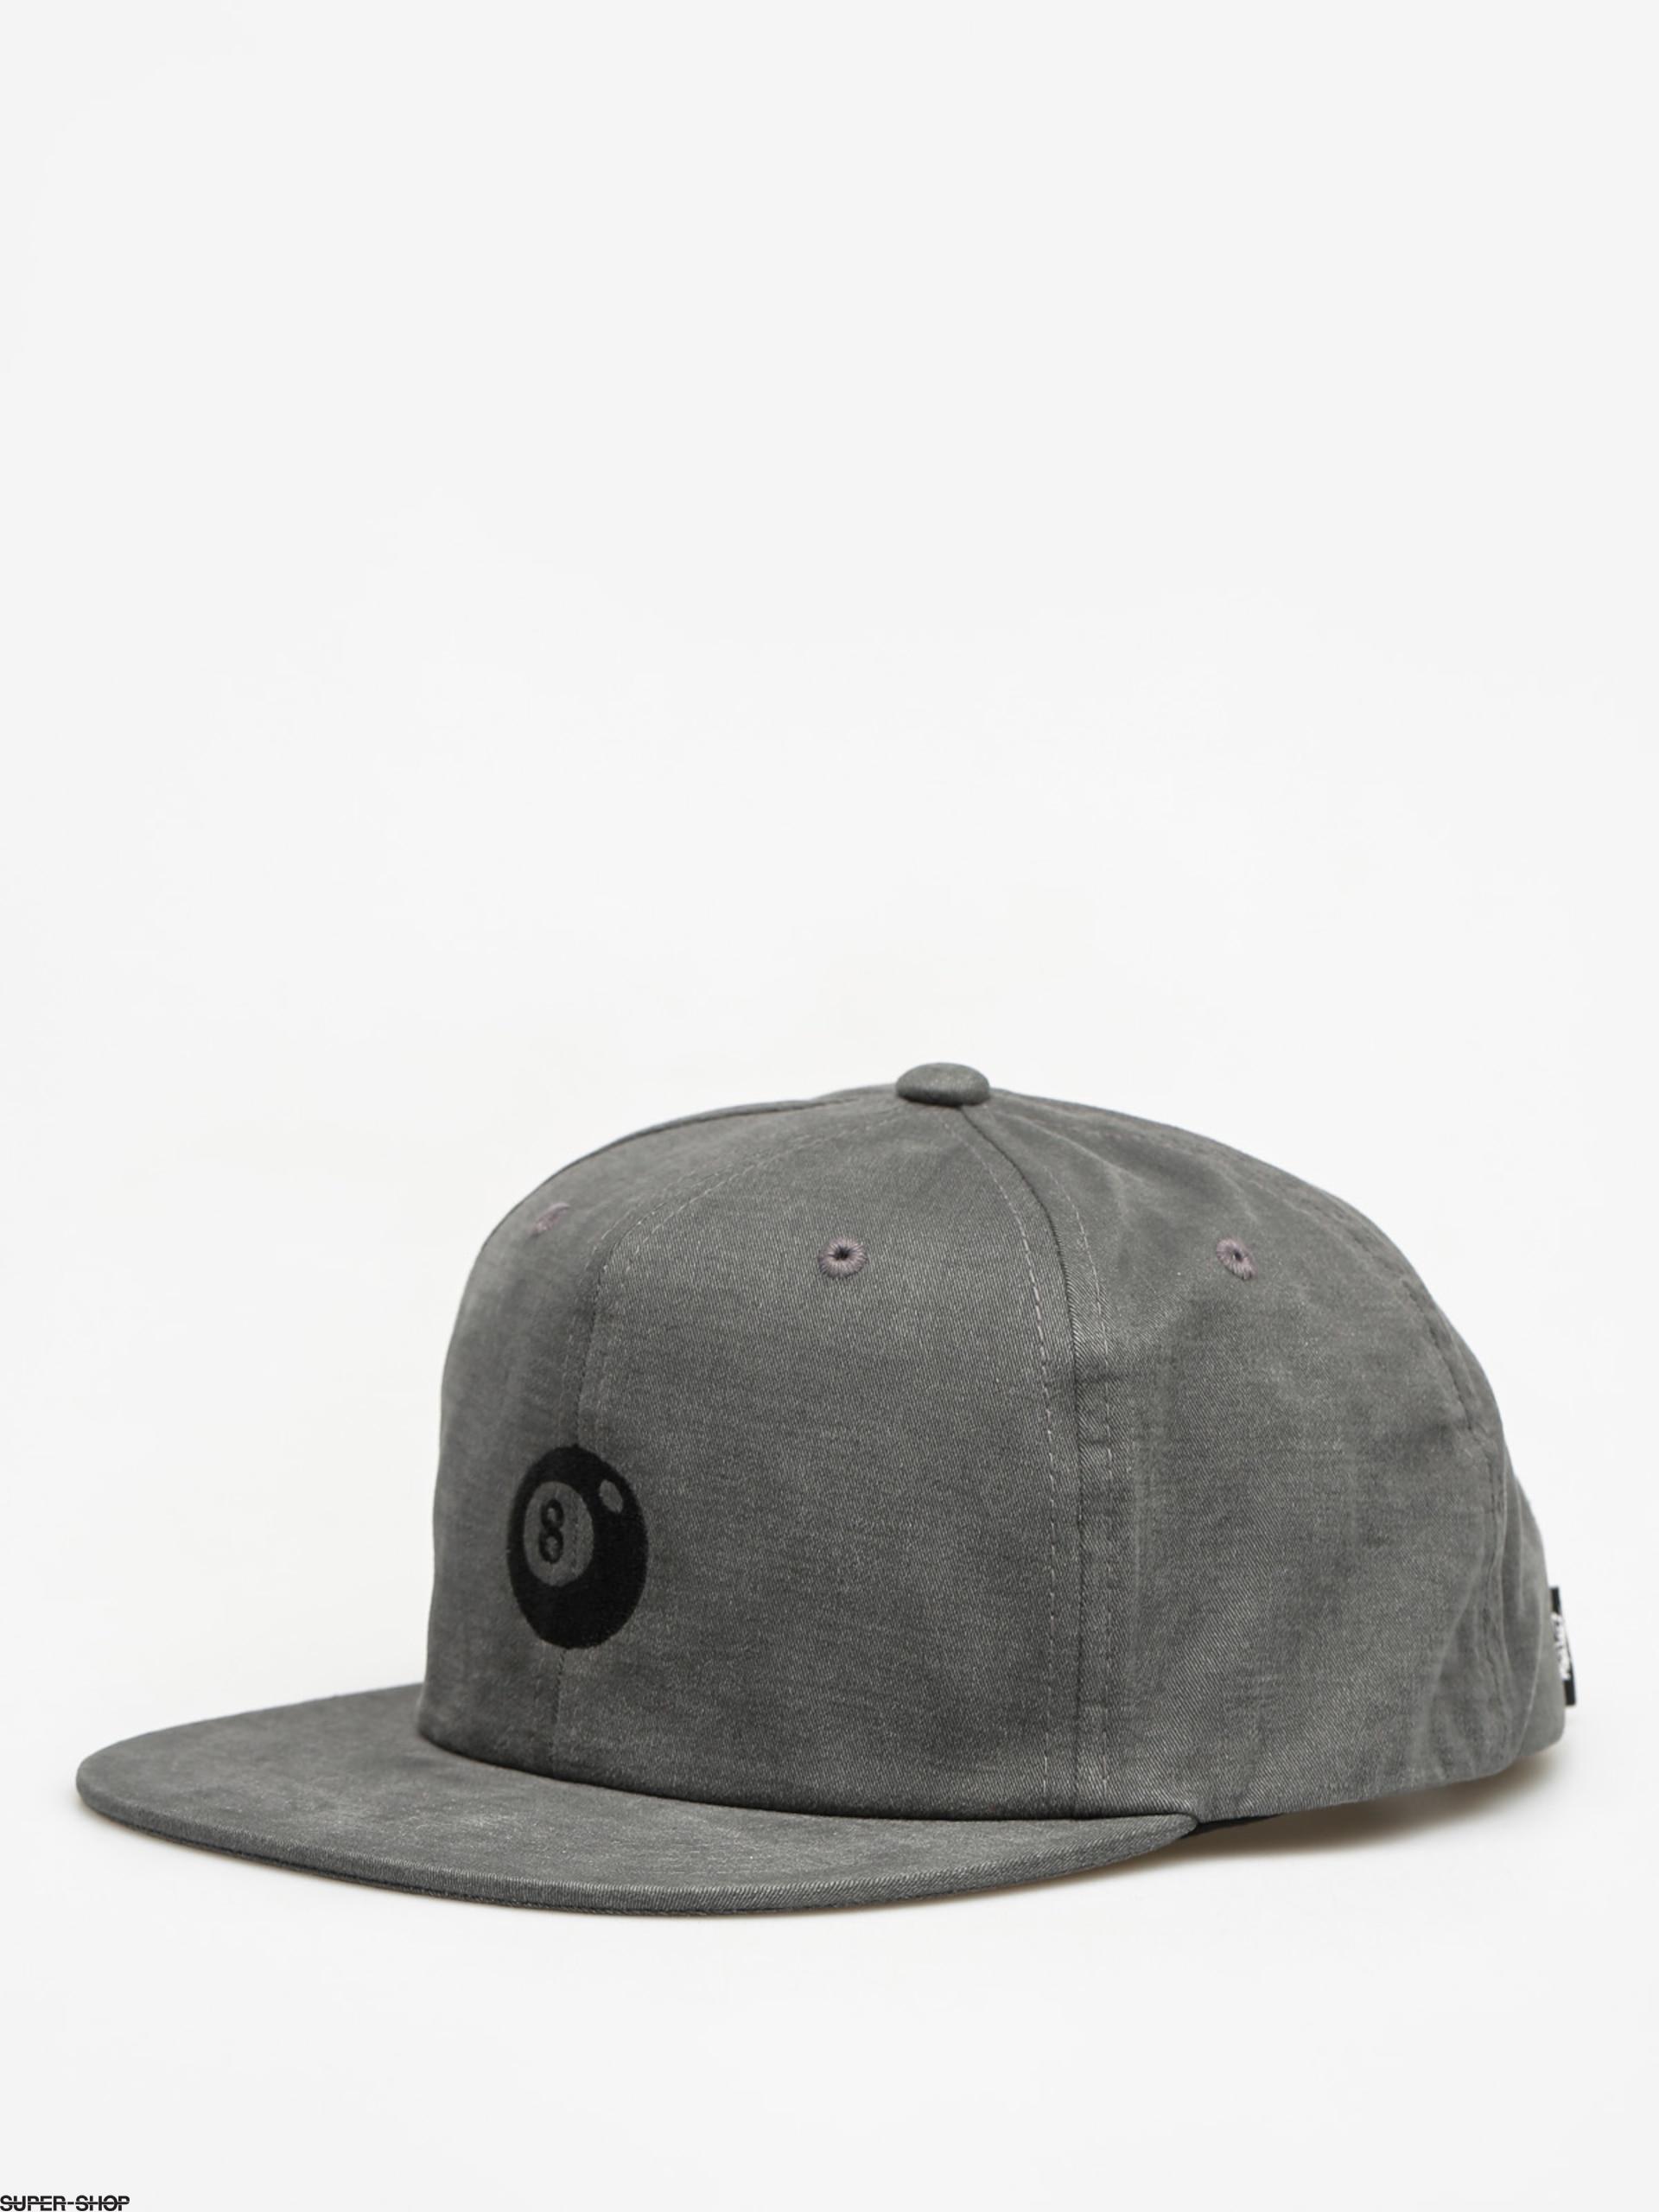 39b9632c867 Stussy Cap 8 Ball Strapback (black)